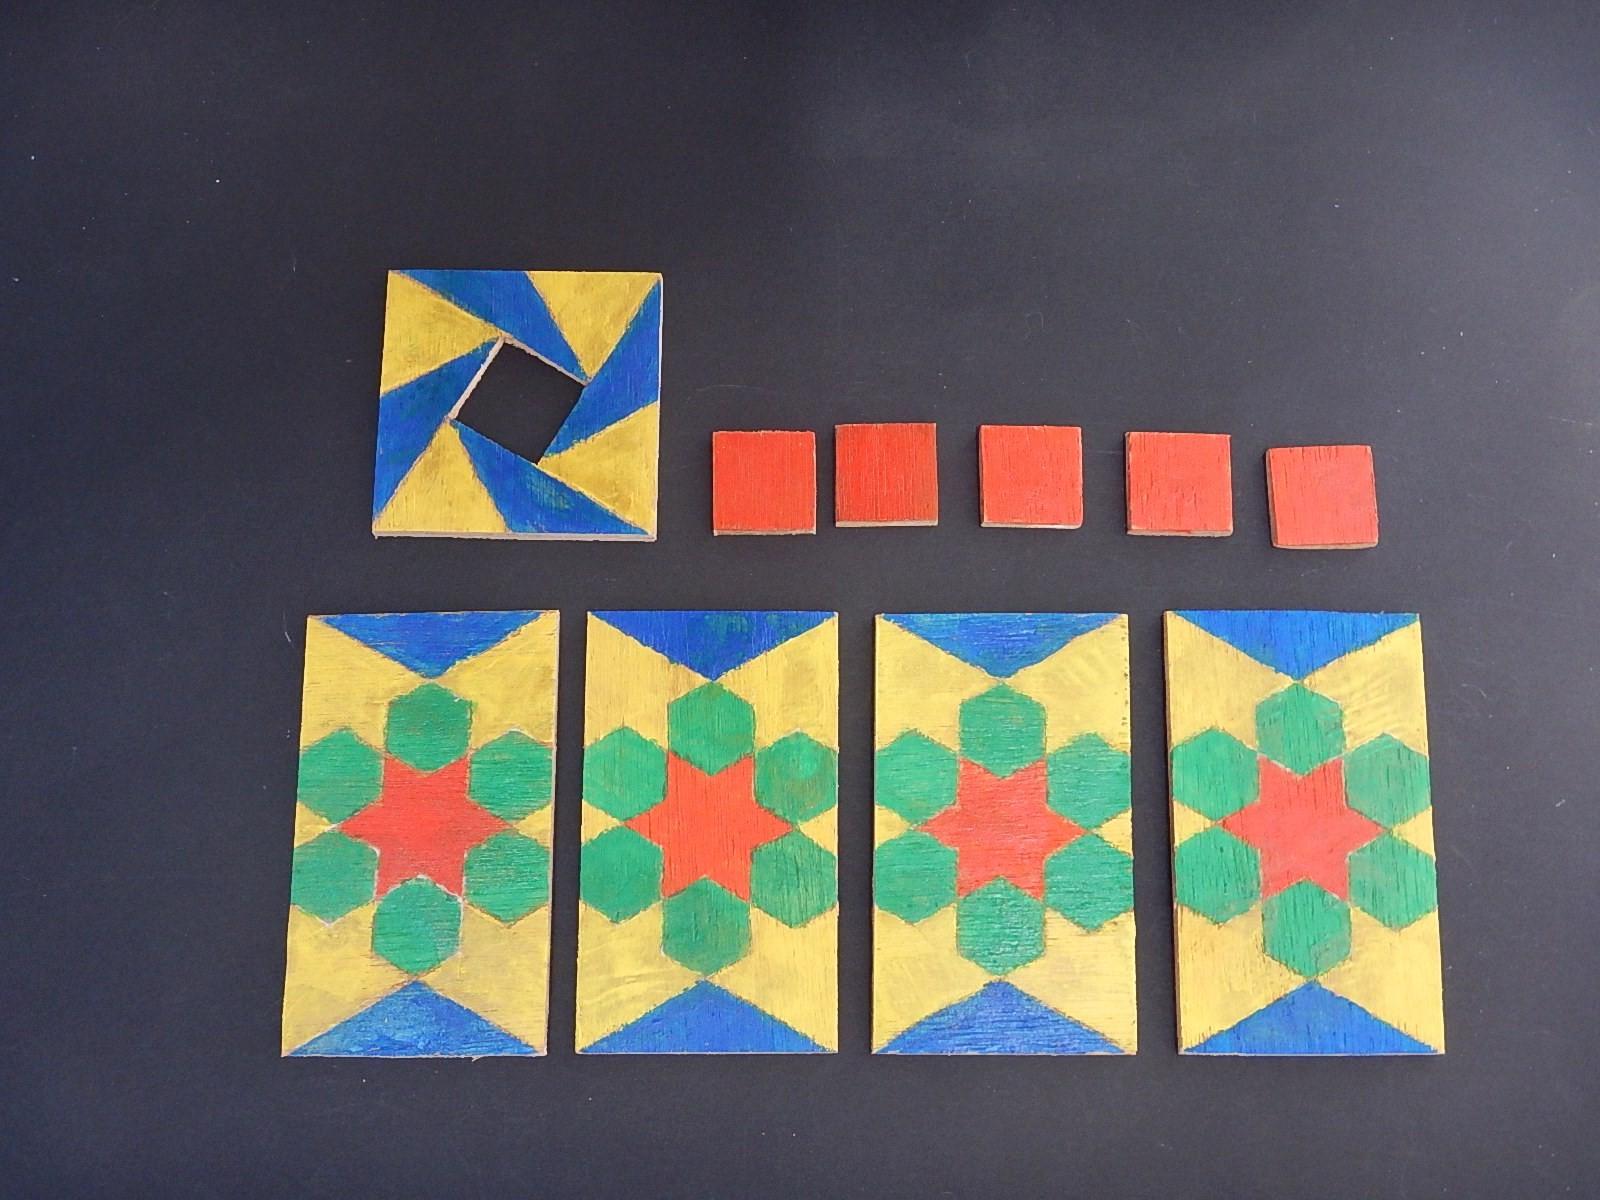 Puzzel van triplex